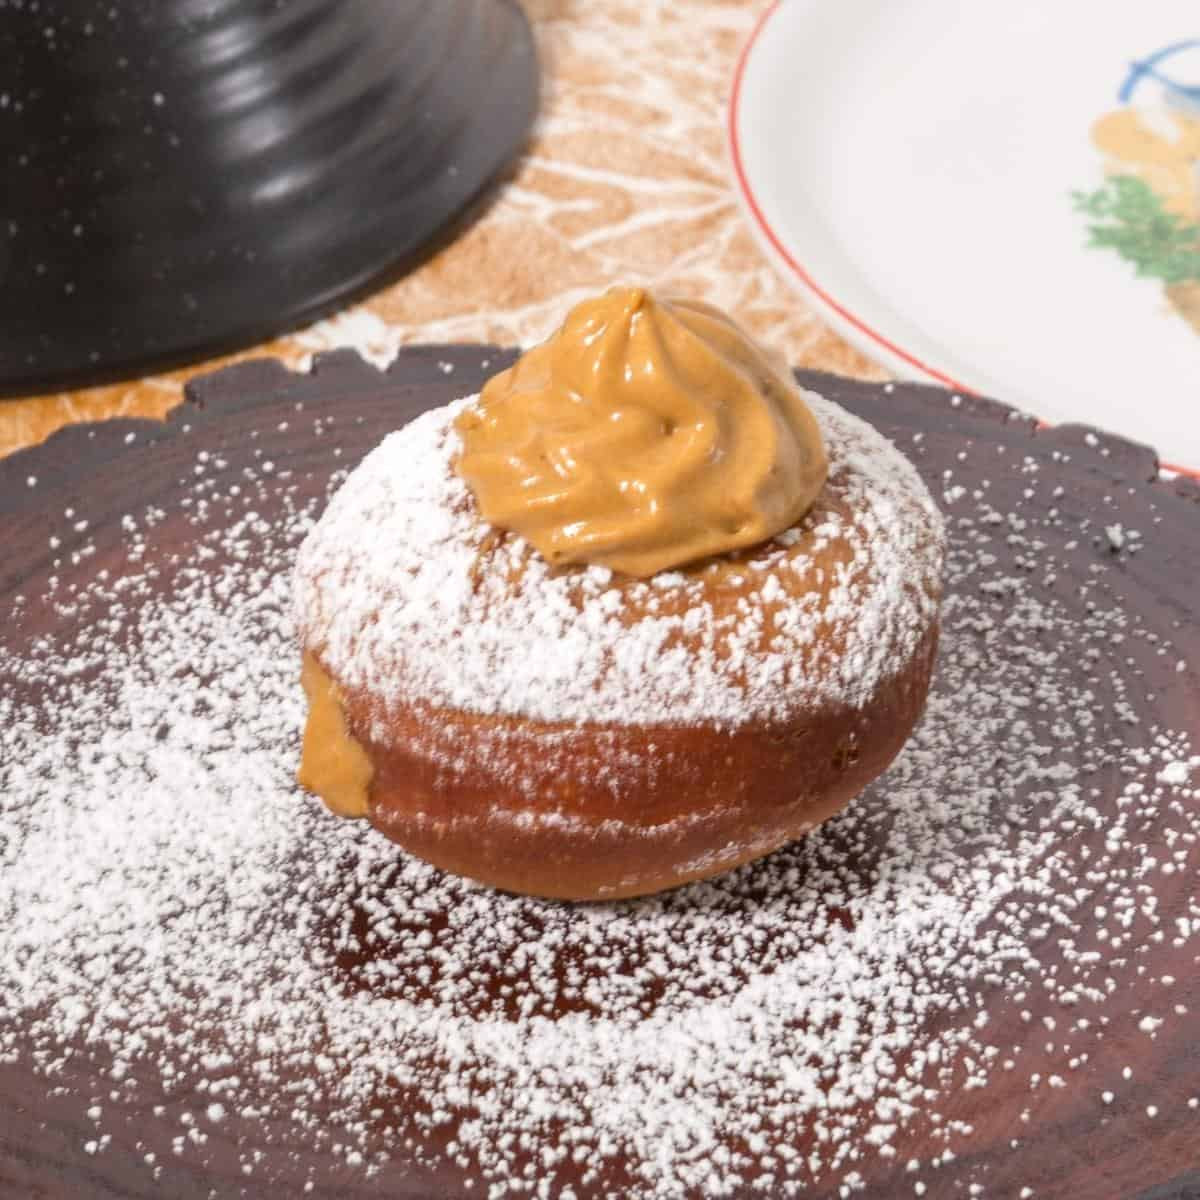 A doughnut topped with dulce de leche cream